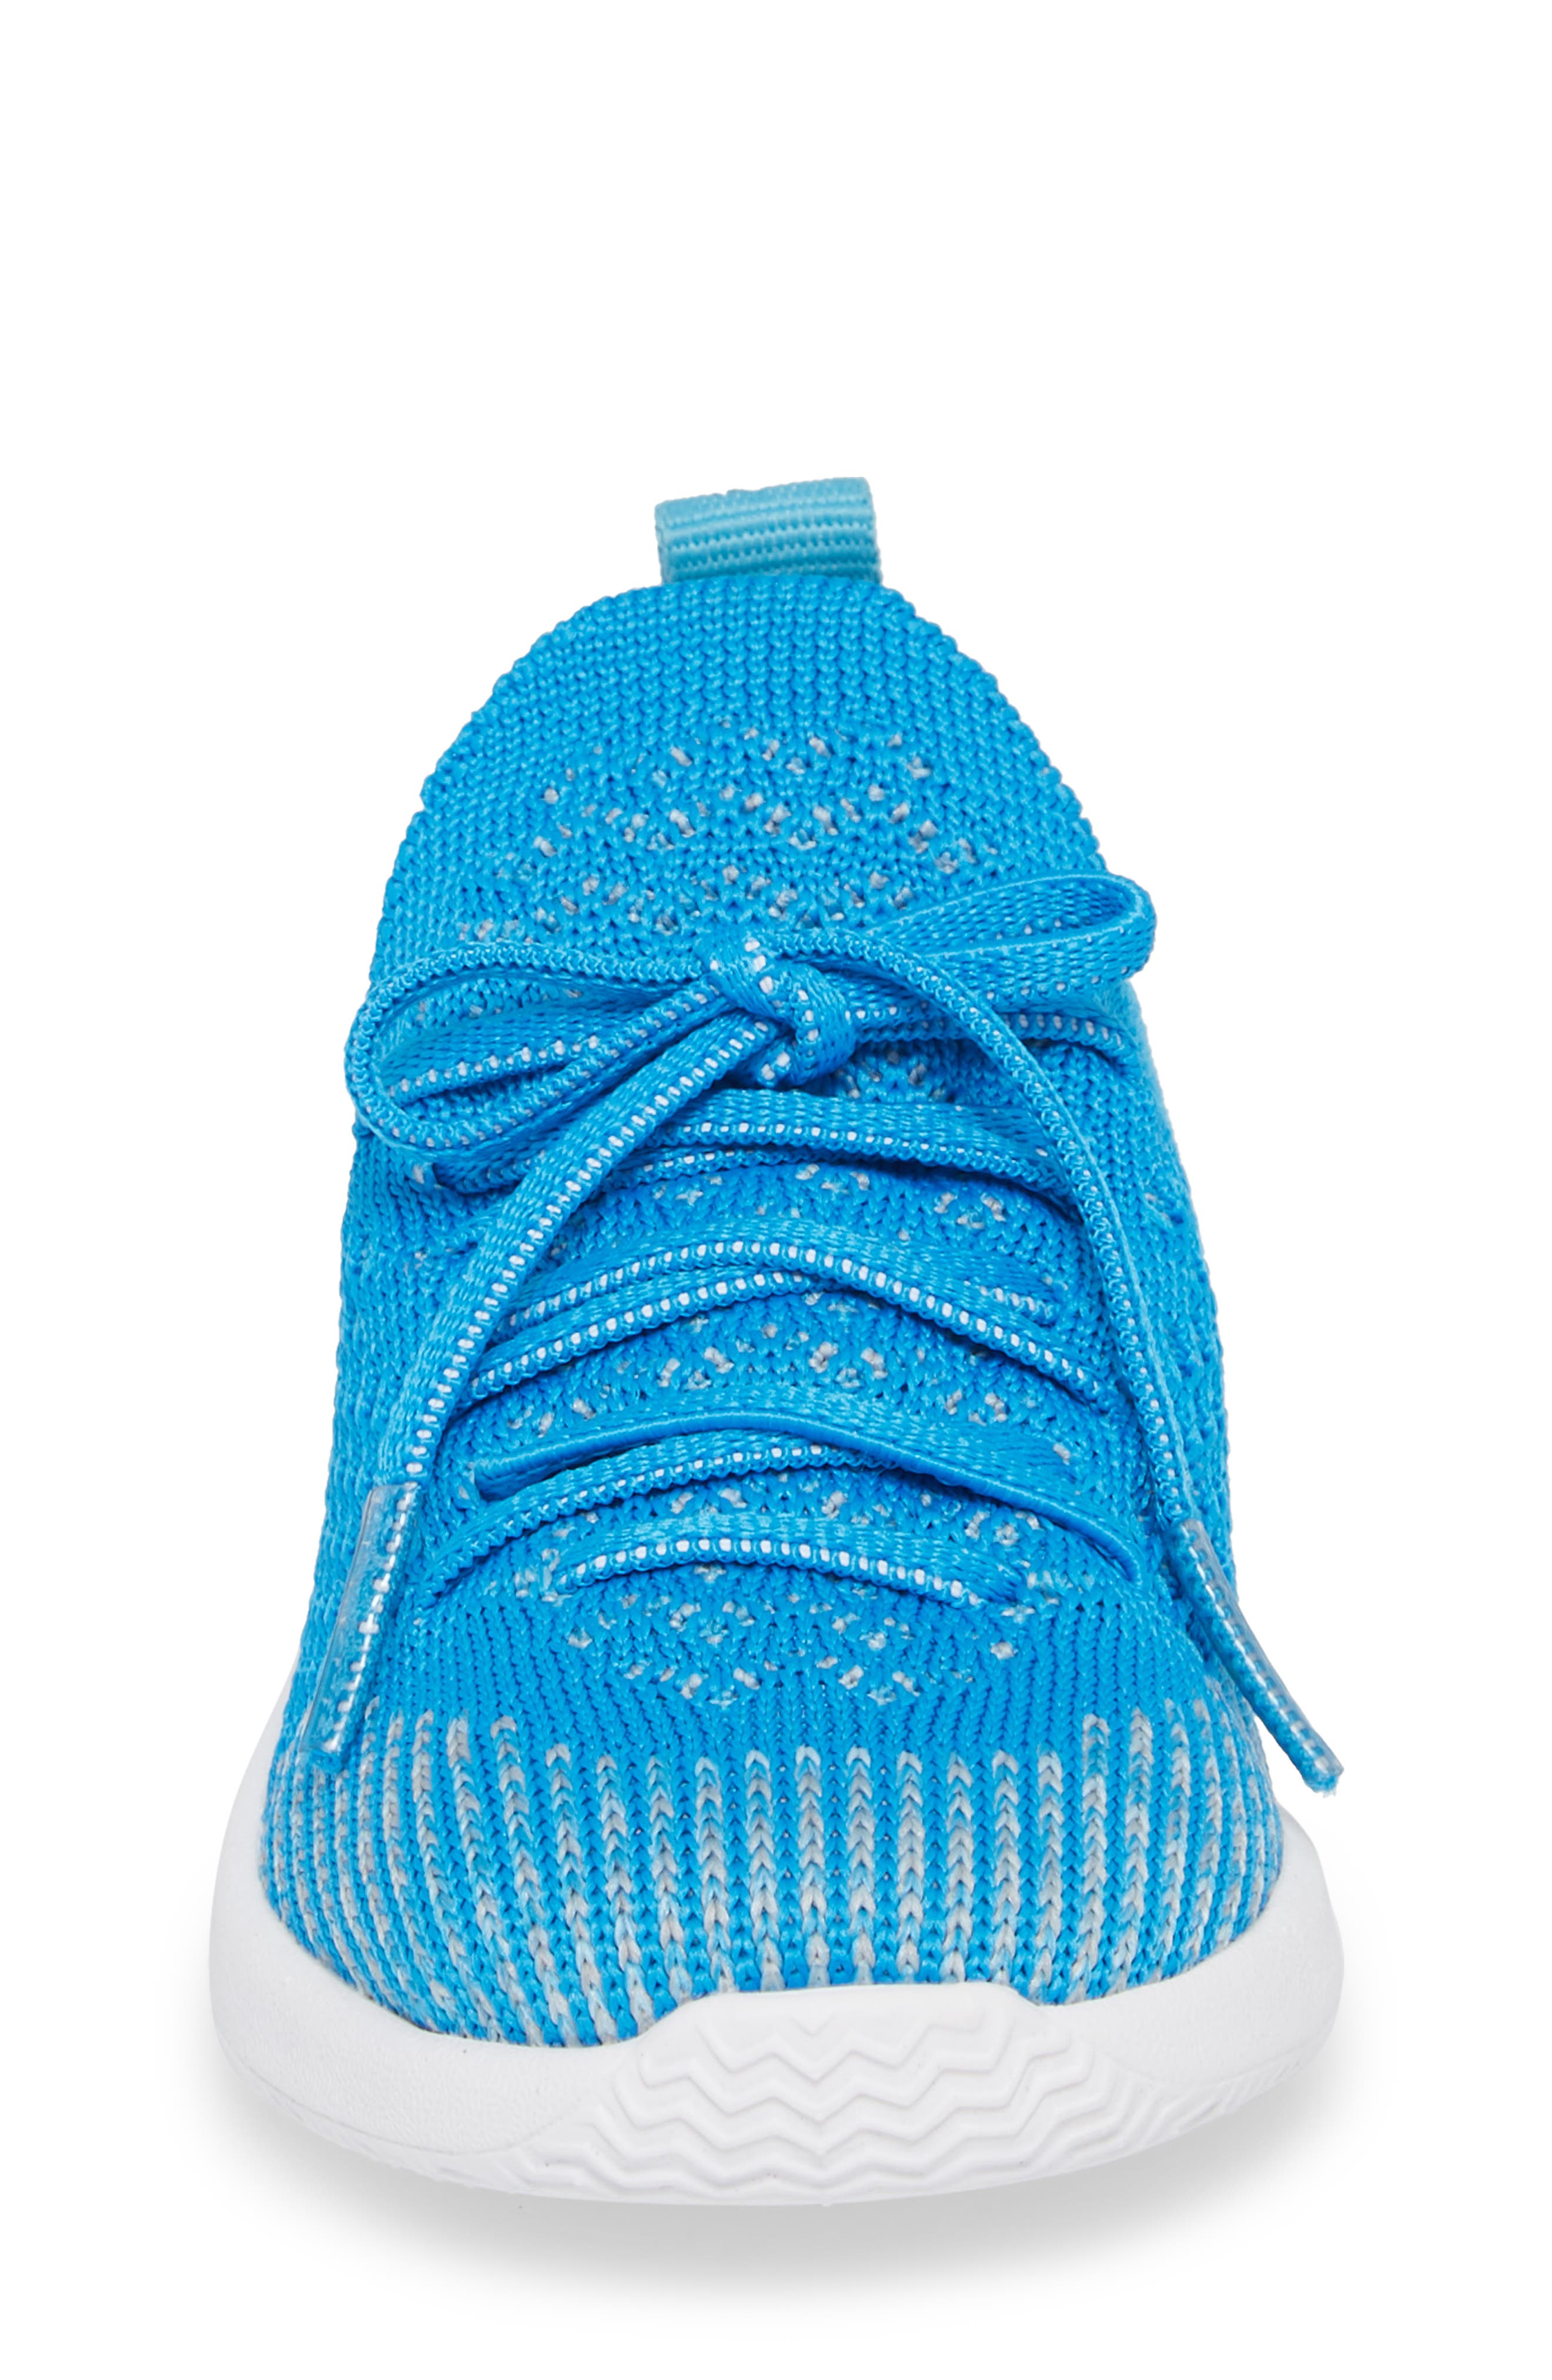 AP Mercury LiteKnit Sneaker,                             Alternate thumbnail 4, color,                             Wave Blue/ Shell White